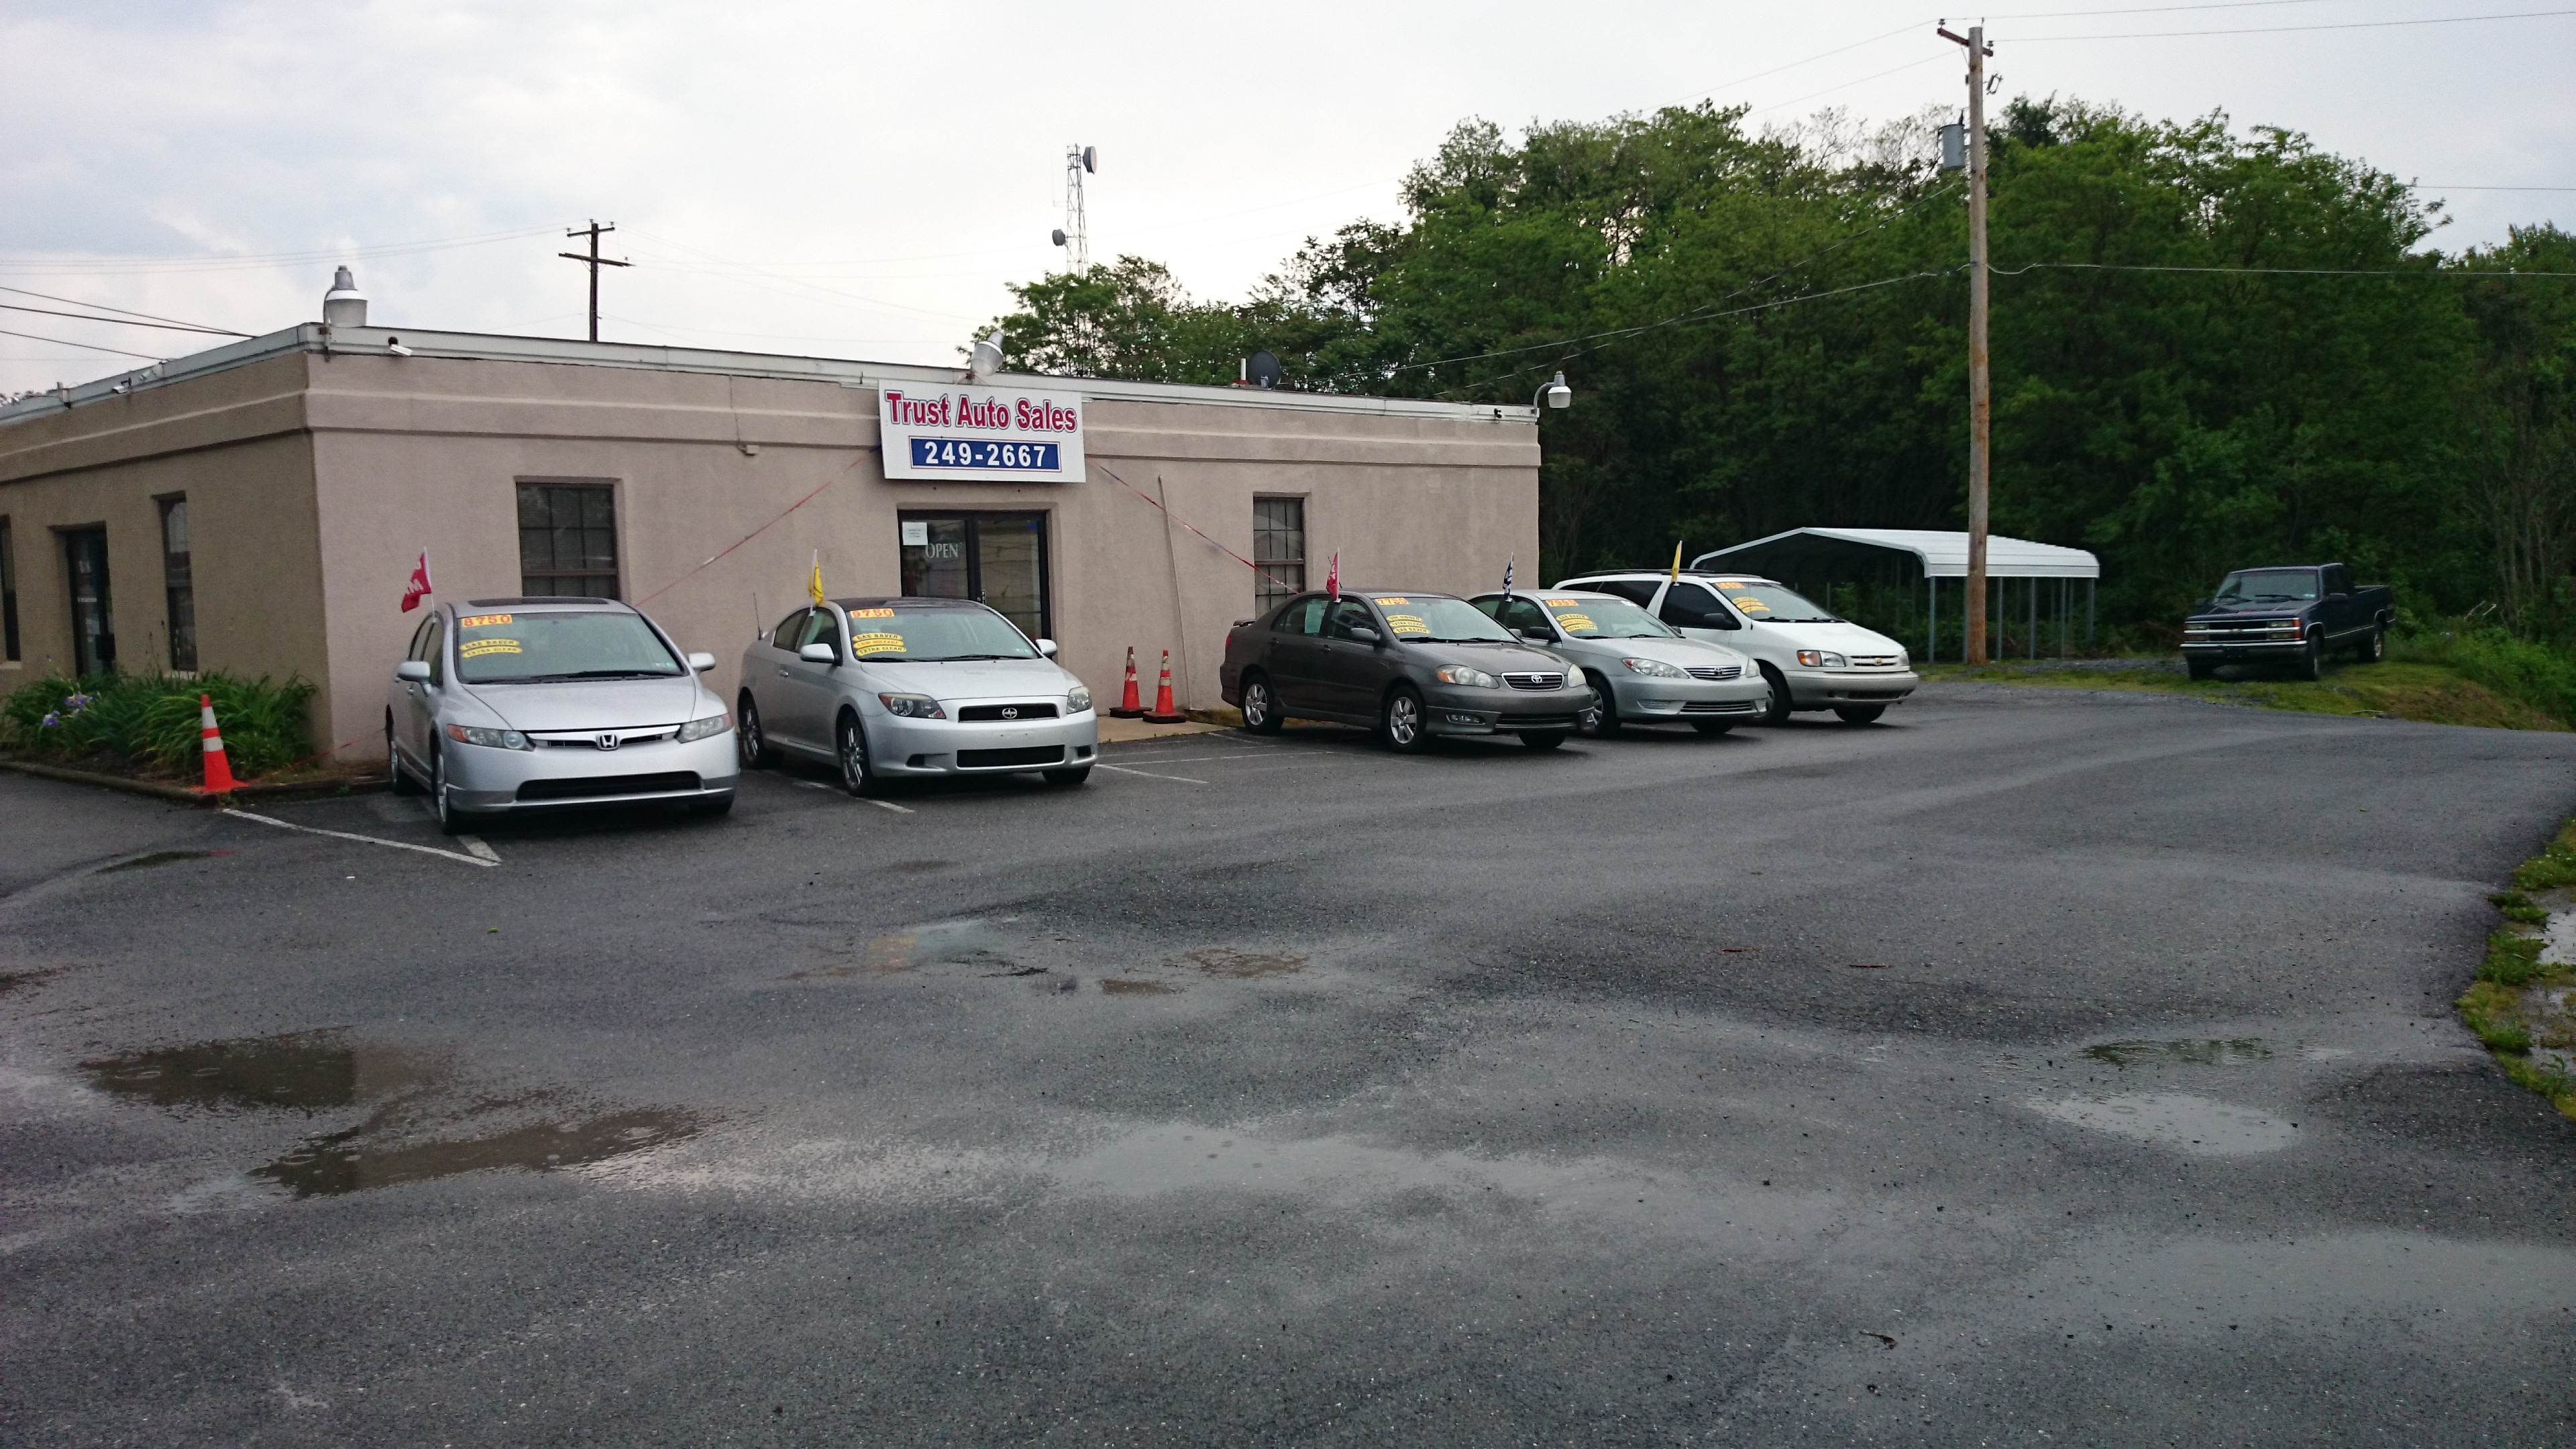 Trust Auto Sales, Carlisle PA